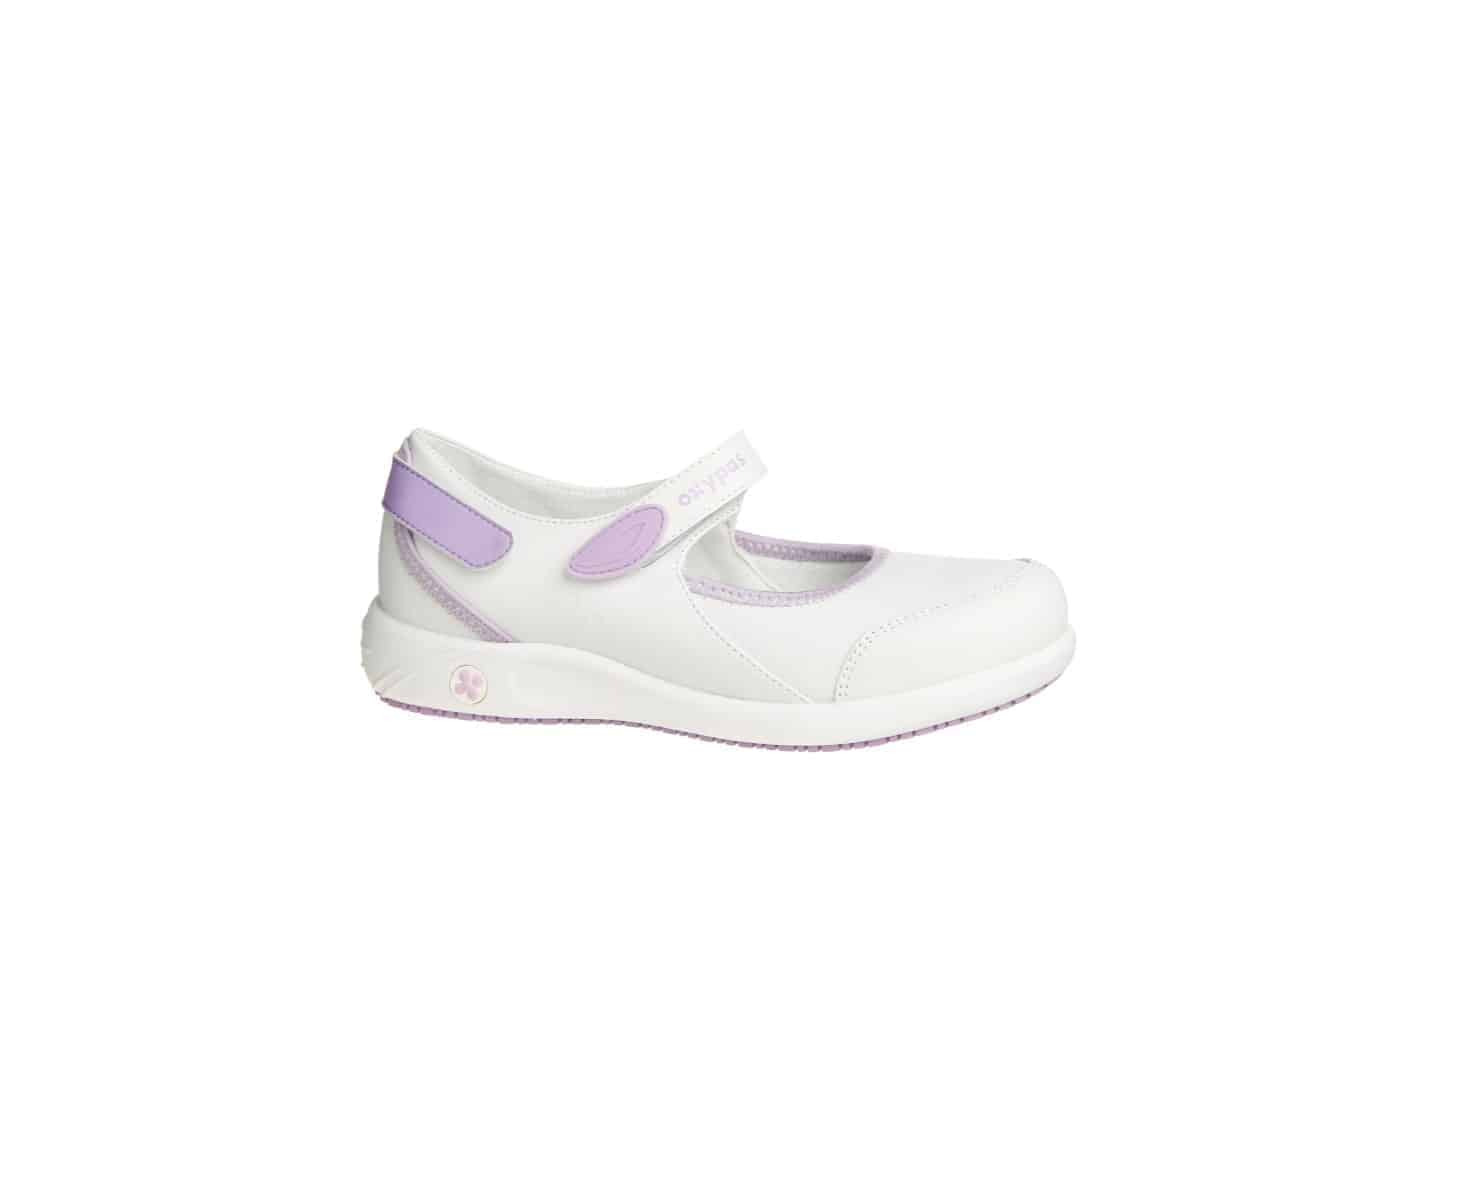 Oxypas Move Nelie, Leather, Mary-Jane Style Nursing Shoe